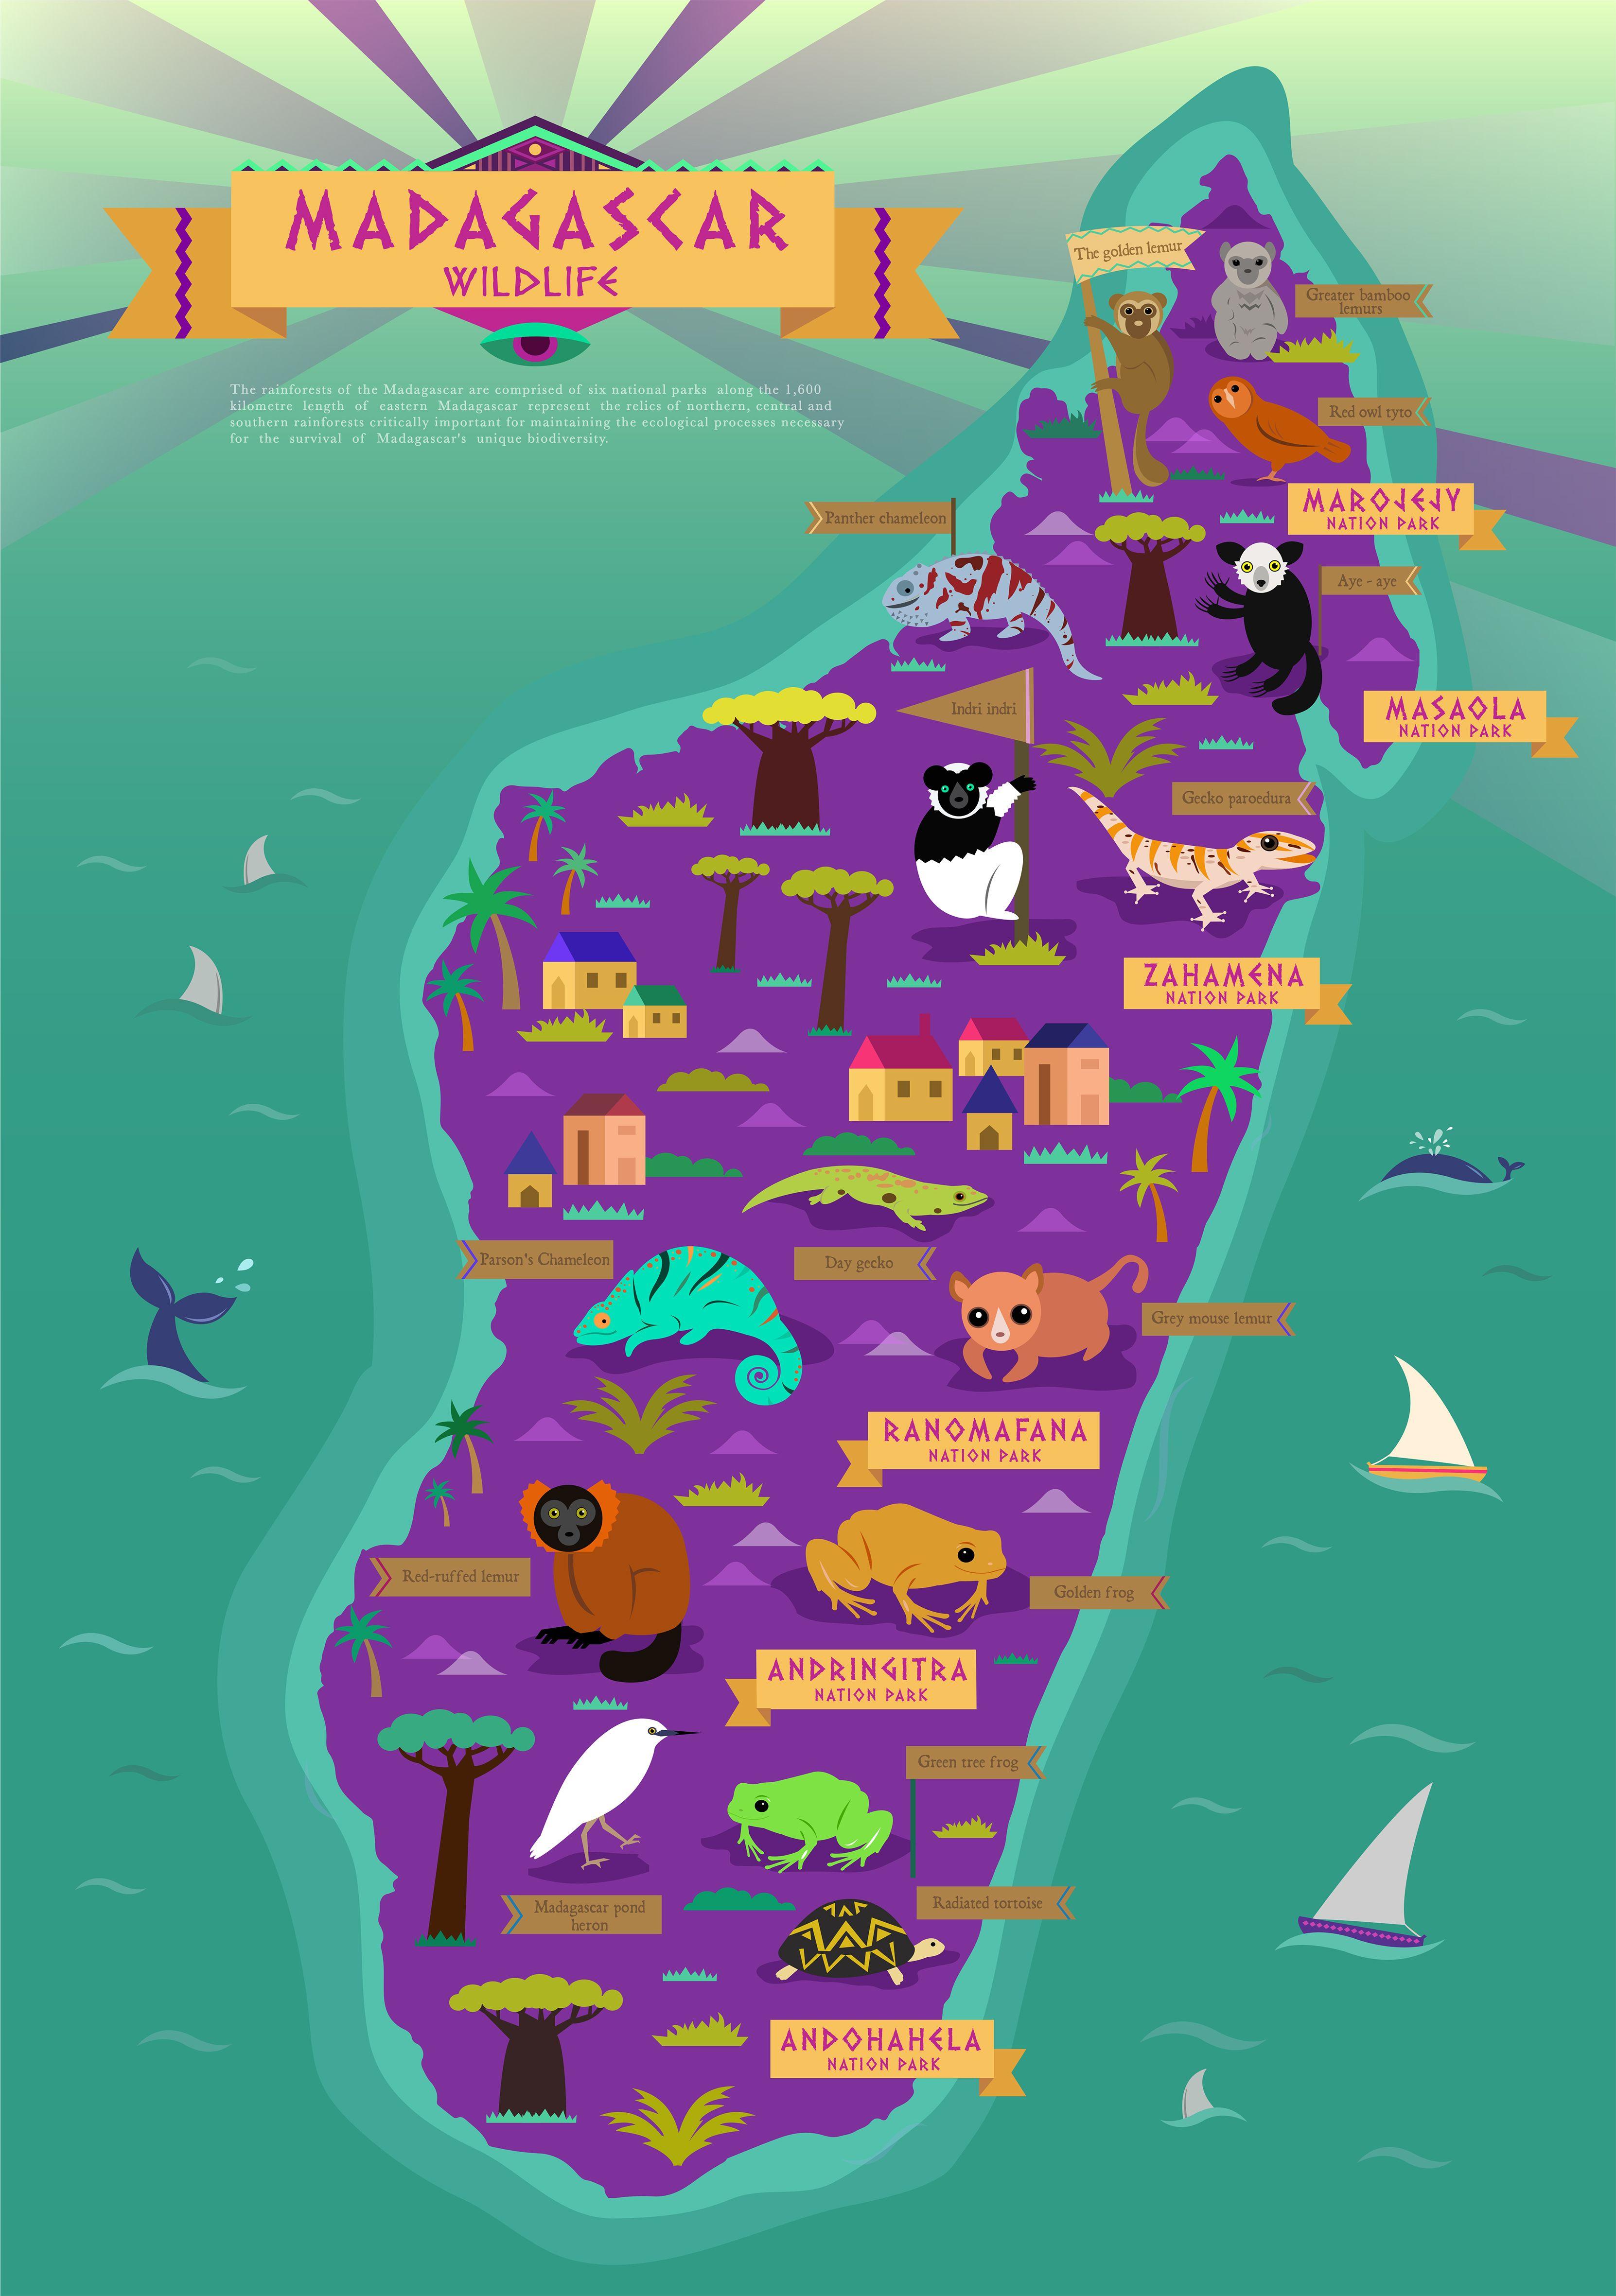 Madagascar wildlife map - artist unknown | Geography, Maps \u0026 The ...